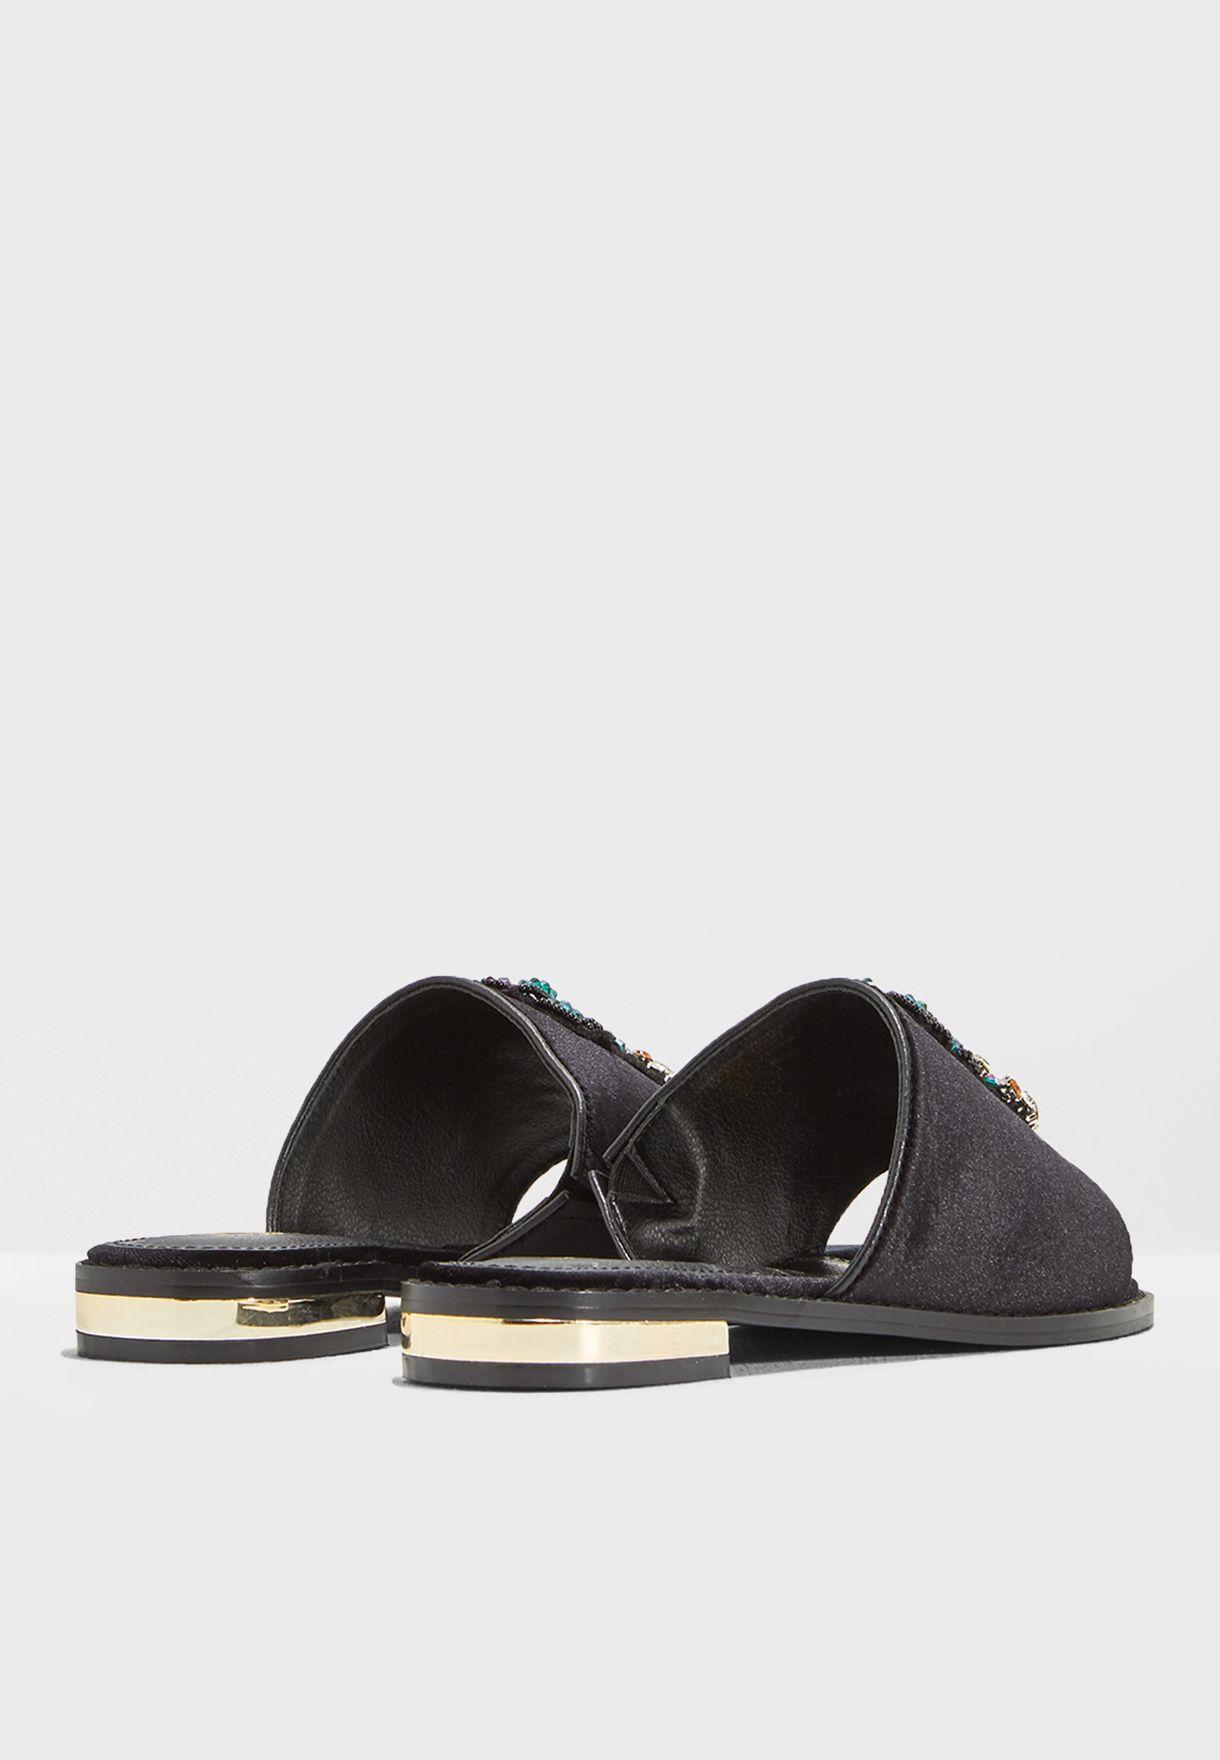 Rona Flat Sandals